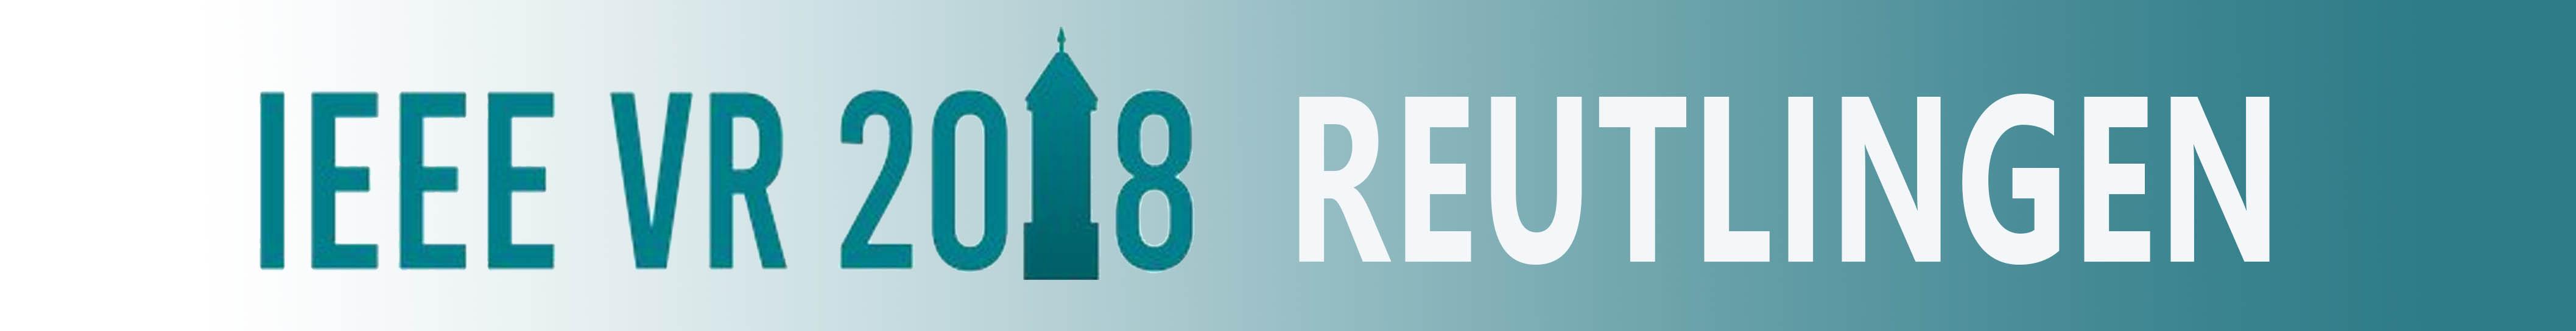 IEEEVR 2018_TechViz Virtual Prototyping_web banner